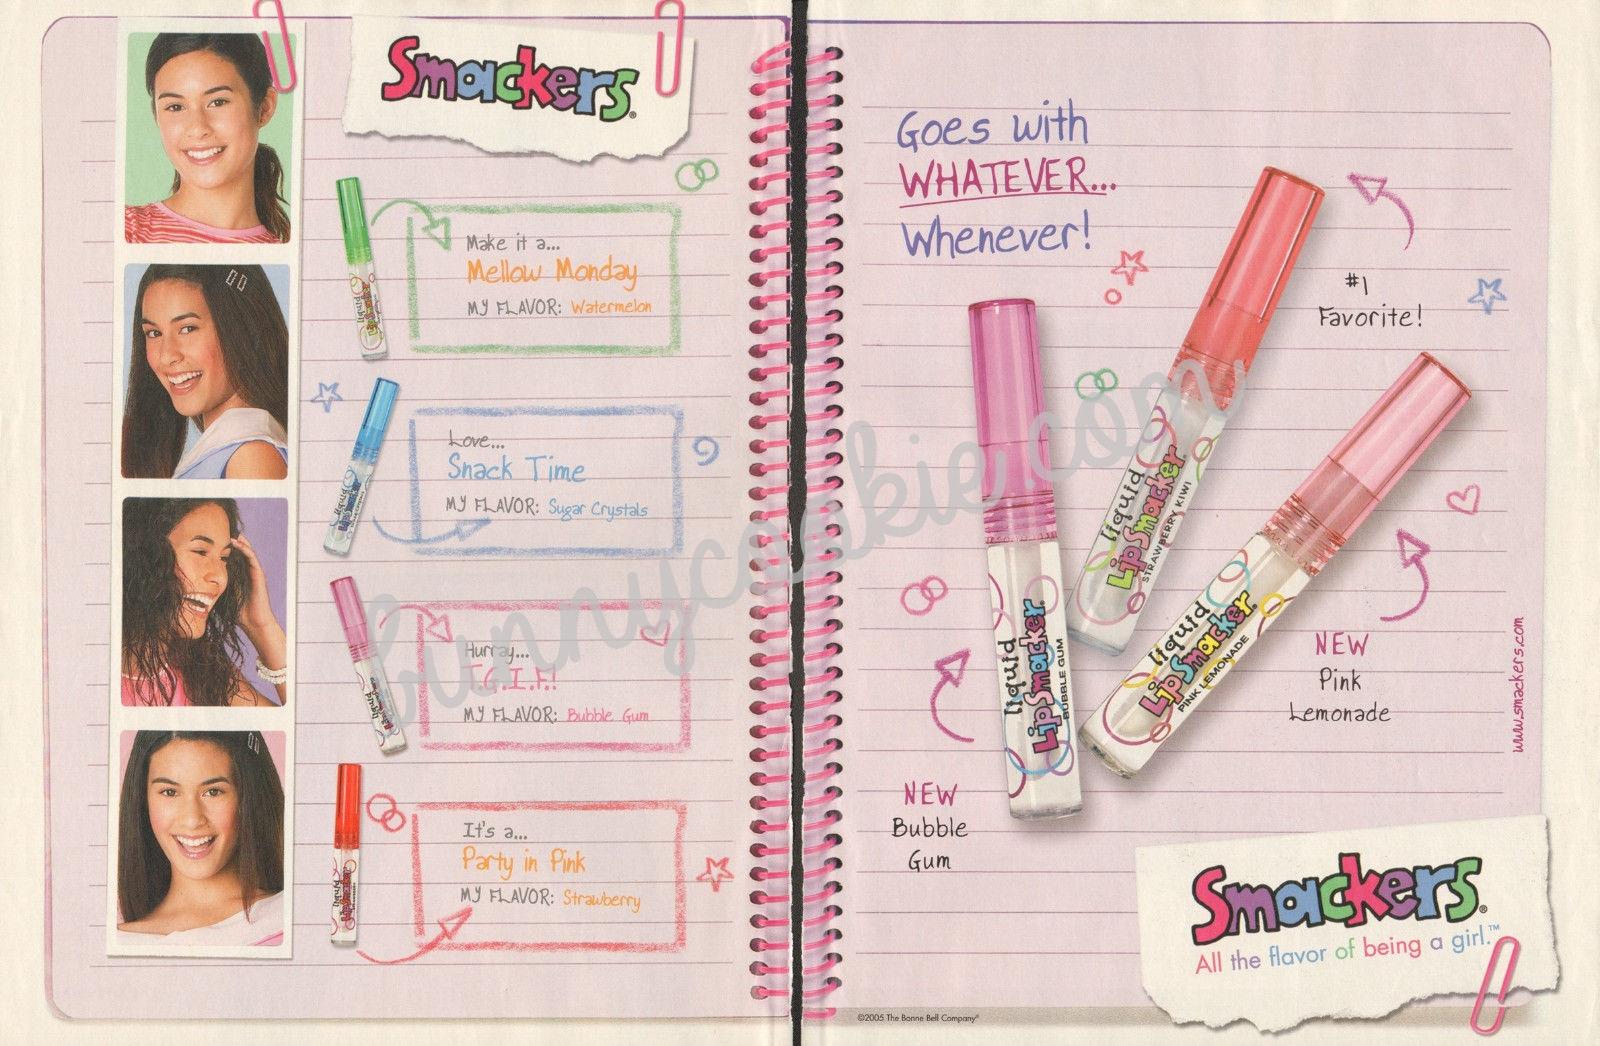 2005 Liquid Lip Smackers ad